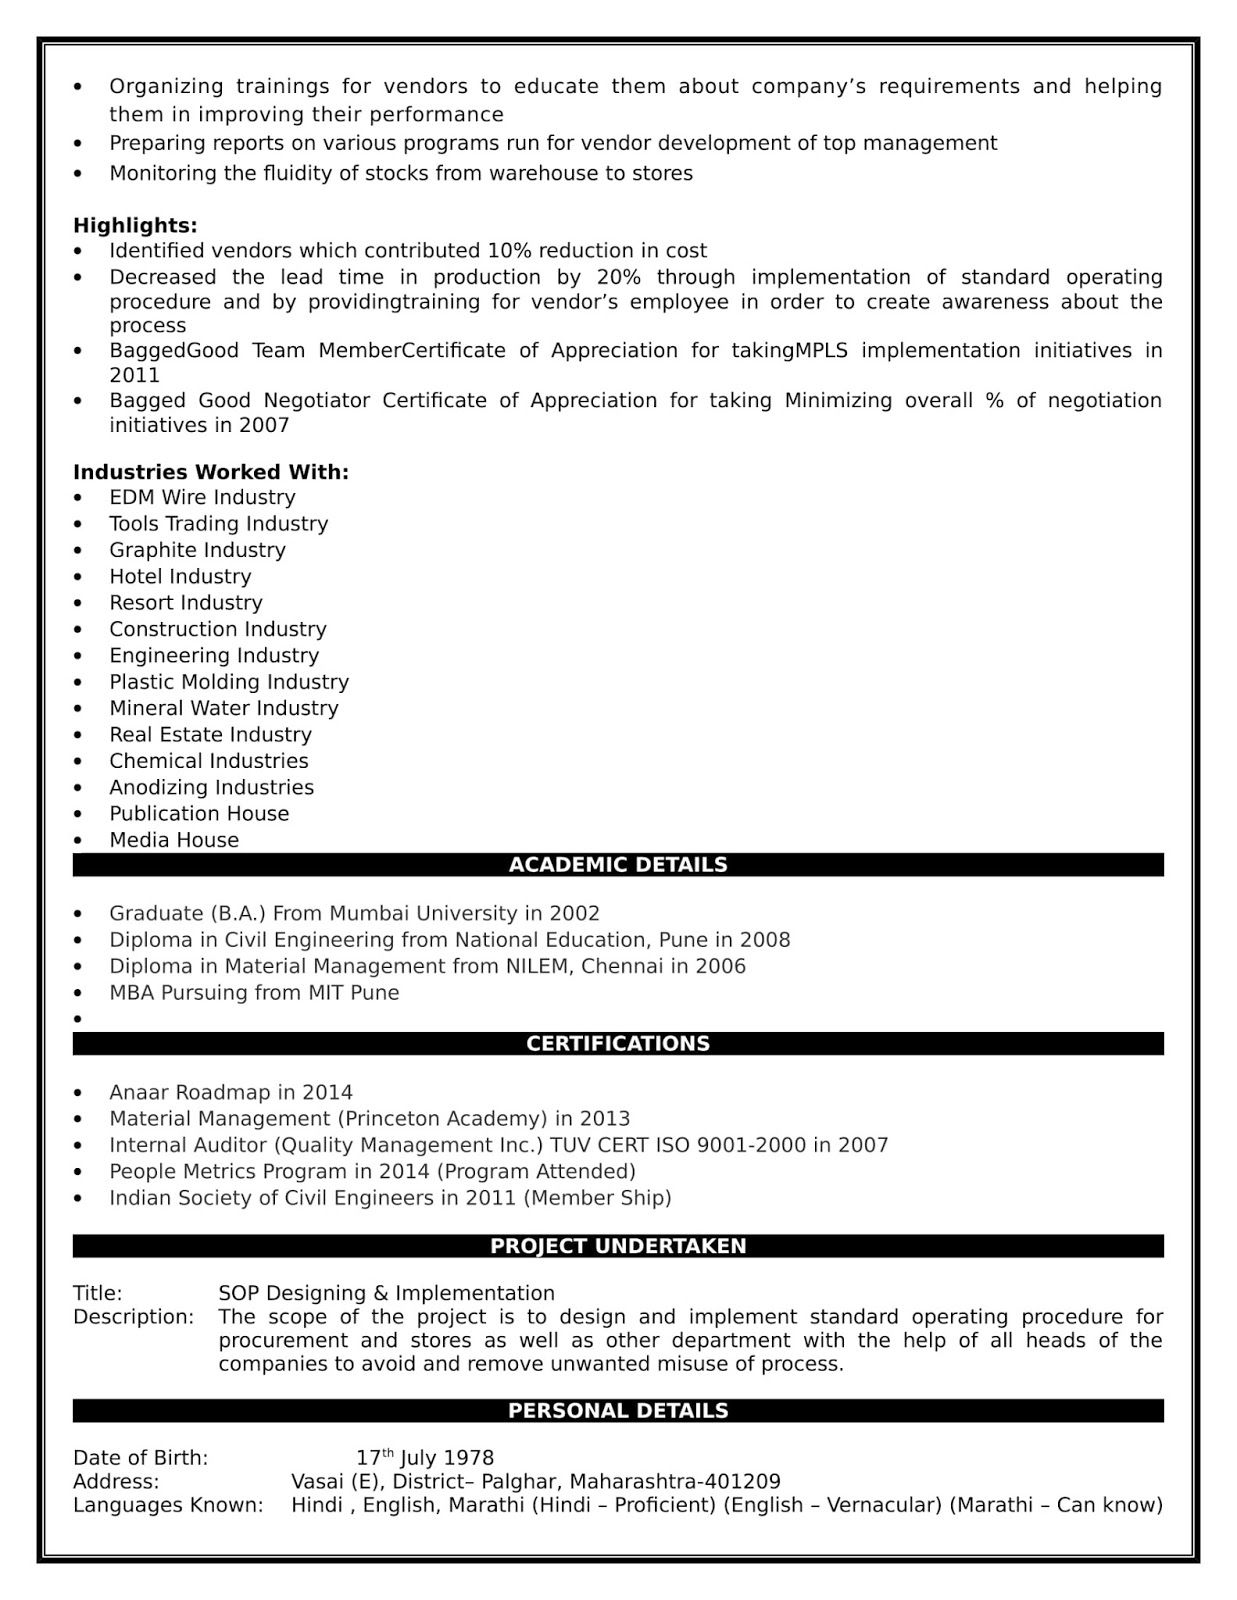 Bimlendra Jha Resume For Purchase Management Ff